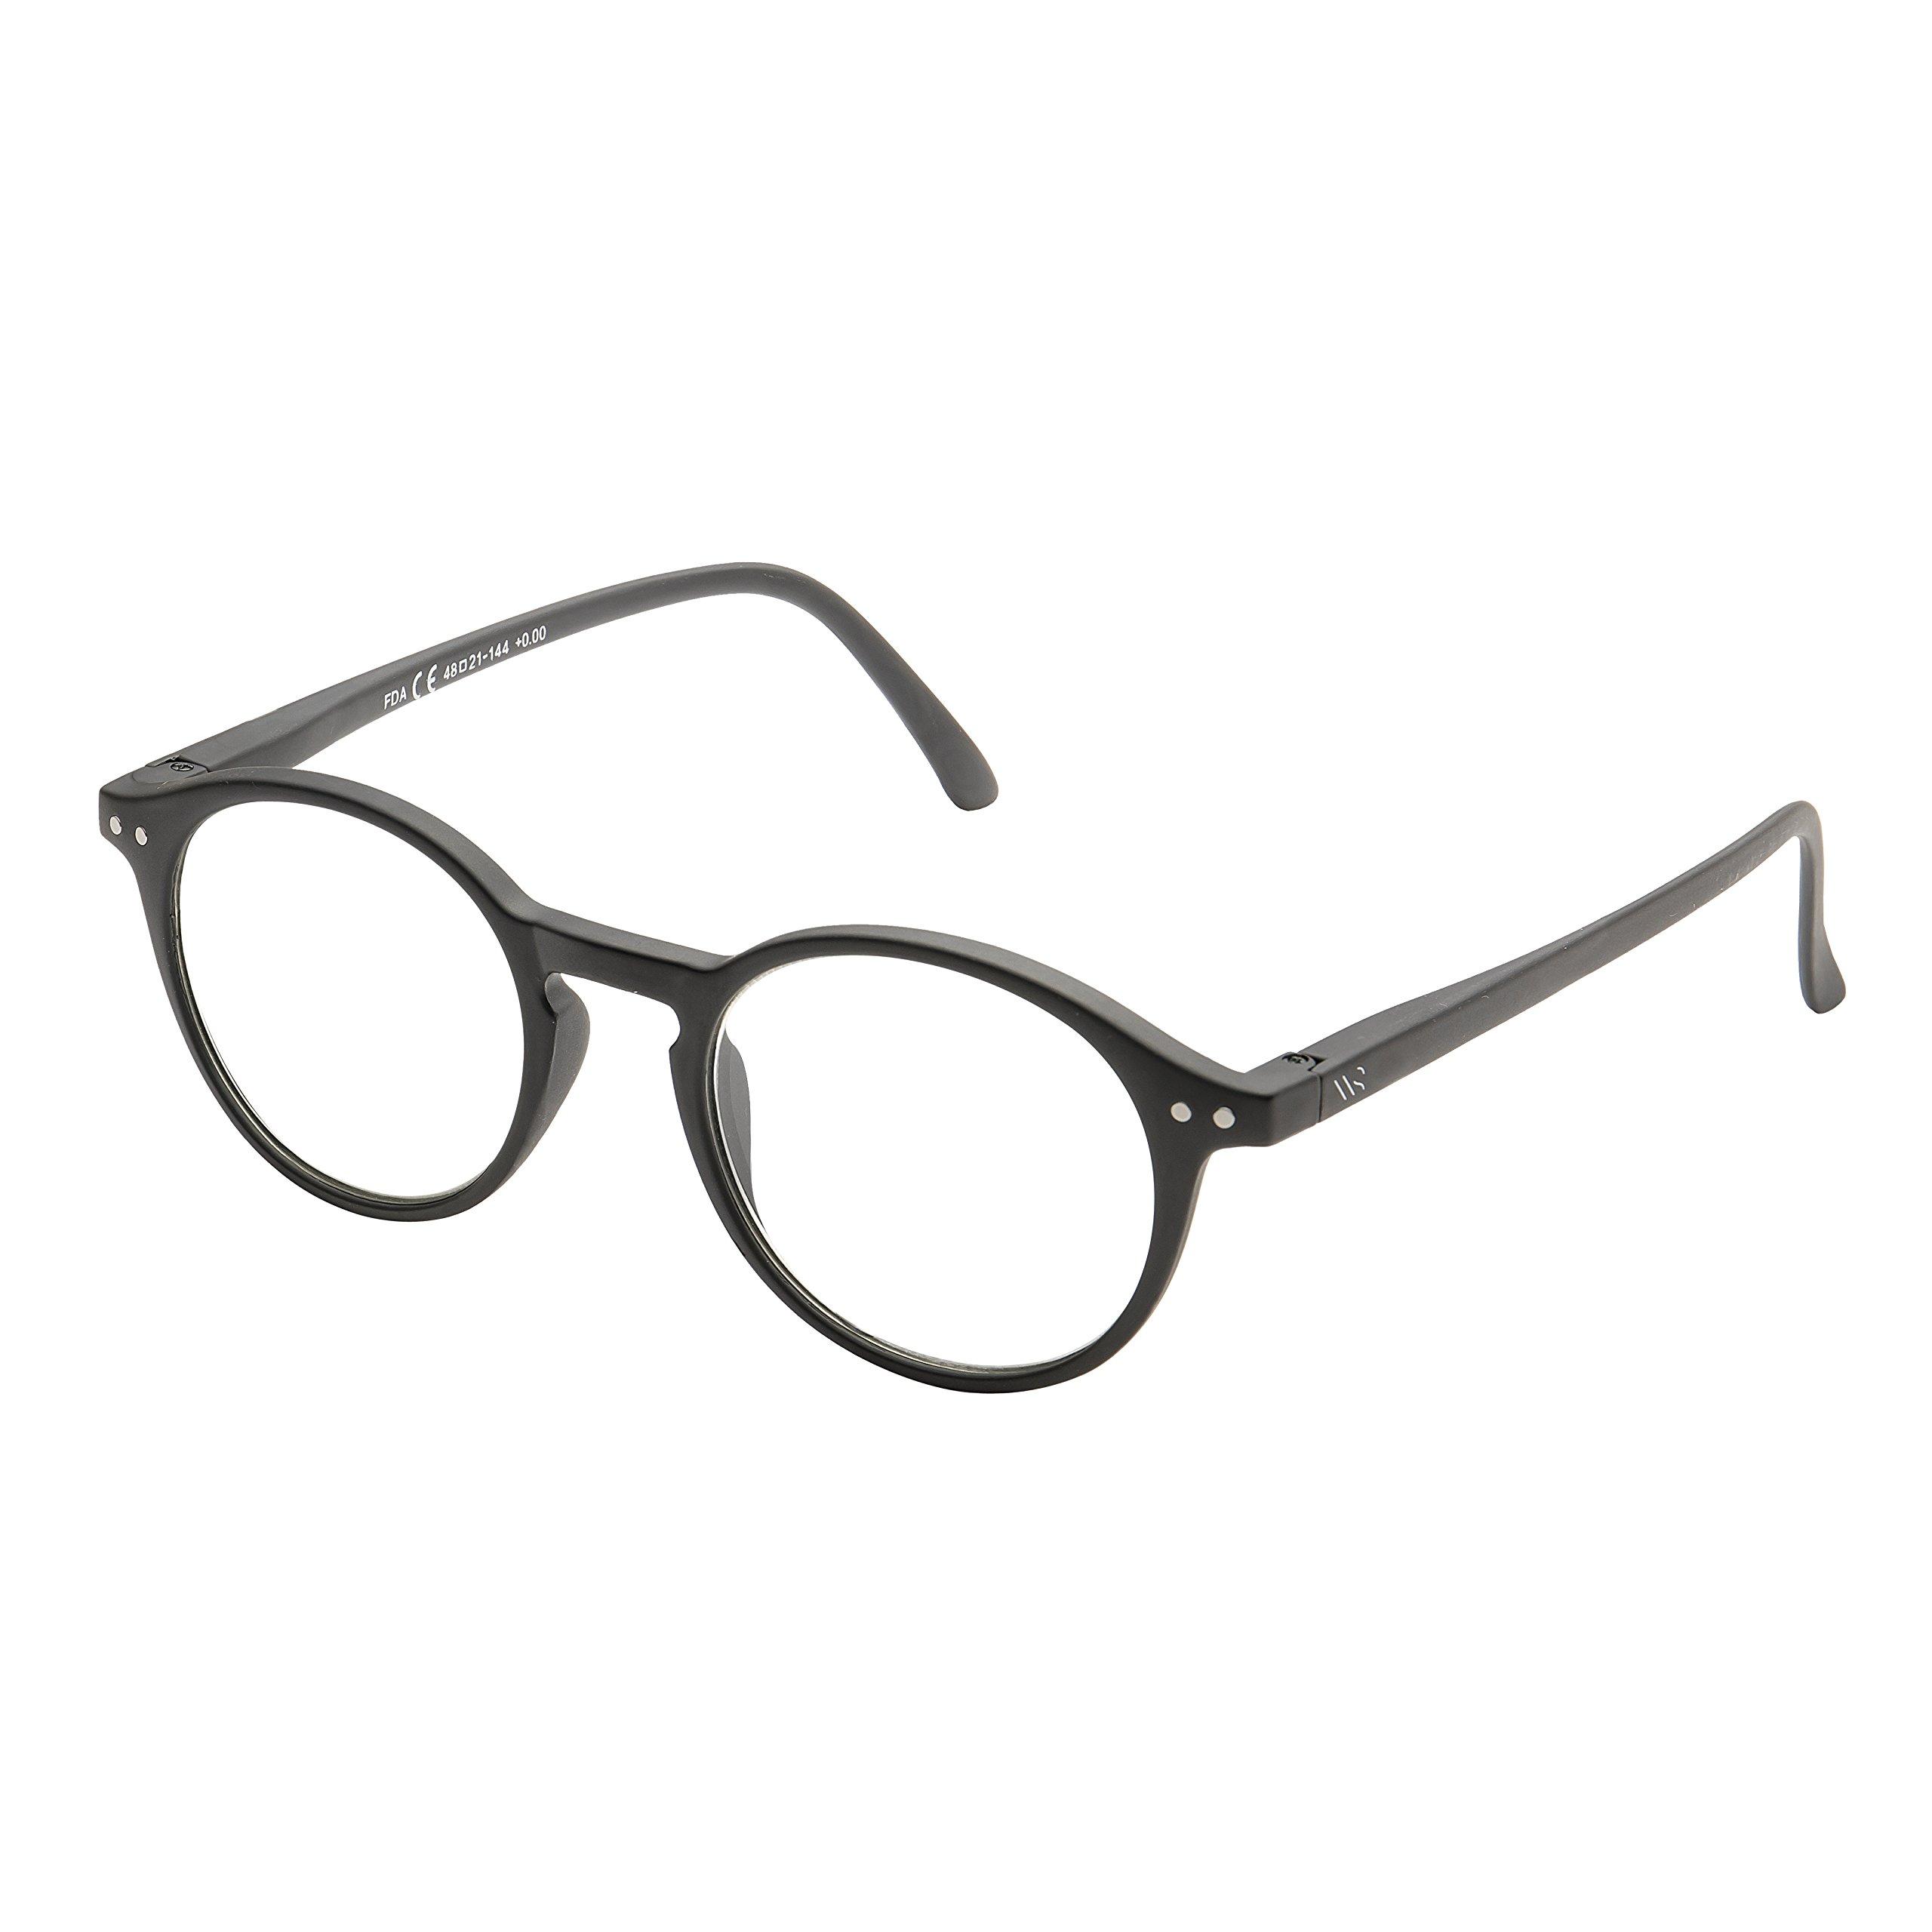 Blue Light Blocking Computer Glasses, Anti UV Eye Strain Clear Lens Reading Video Eyewear, Unisex - Black +0.00 No Magnification by WealthyShades